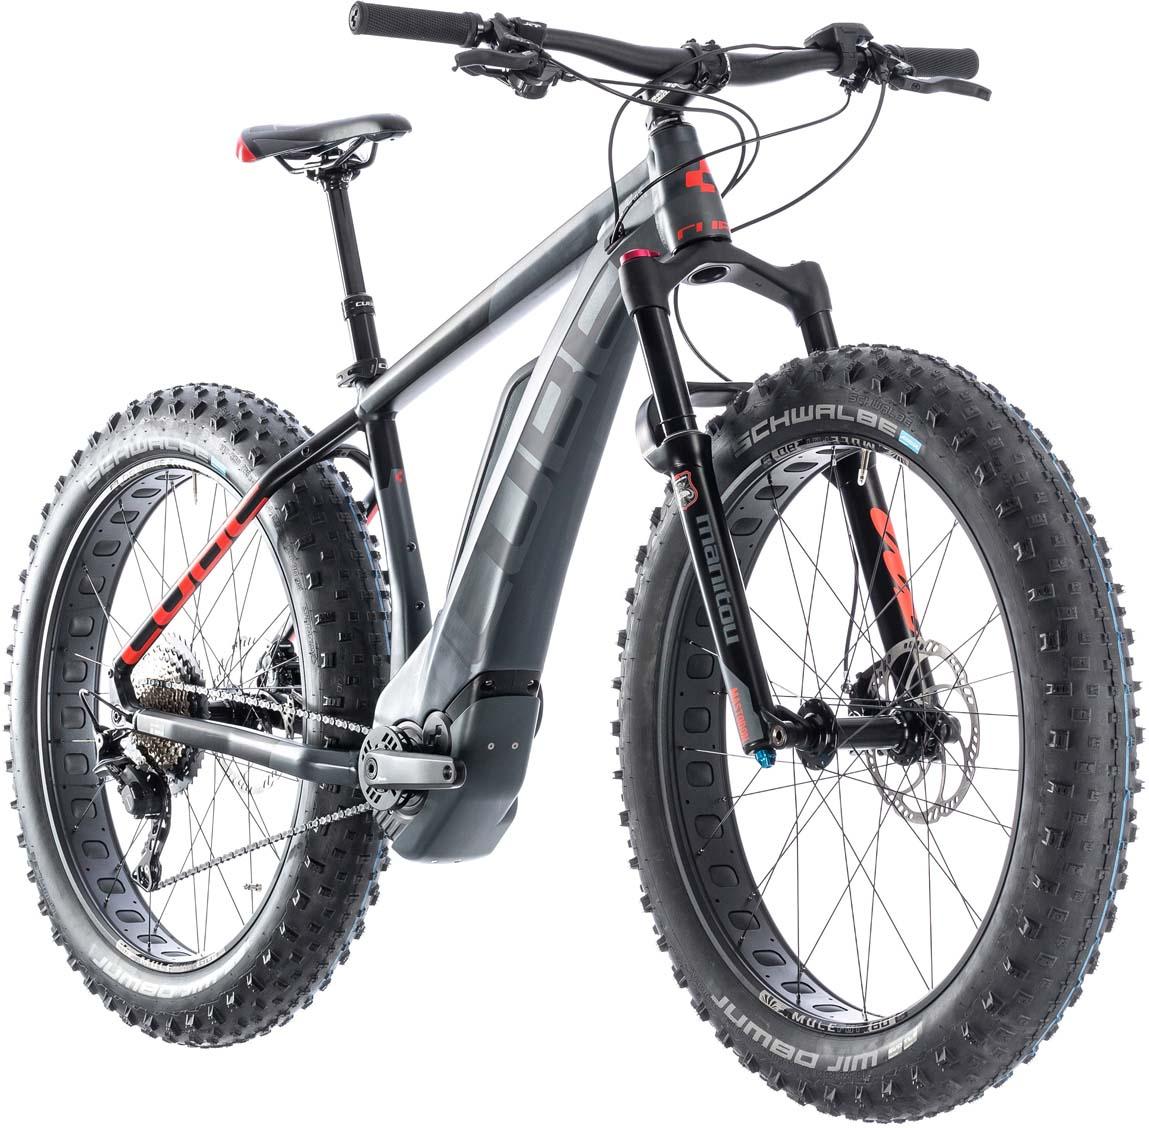 e bike mountainbike fatbikes mountainbikes hardtail e bikes mhw bikes for all. Black Bedroom Furniture Sets. Home Design Ideas